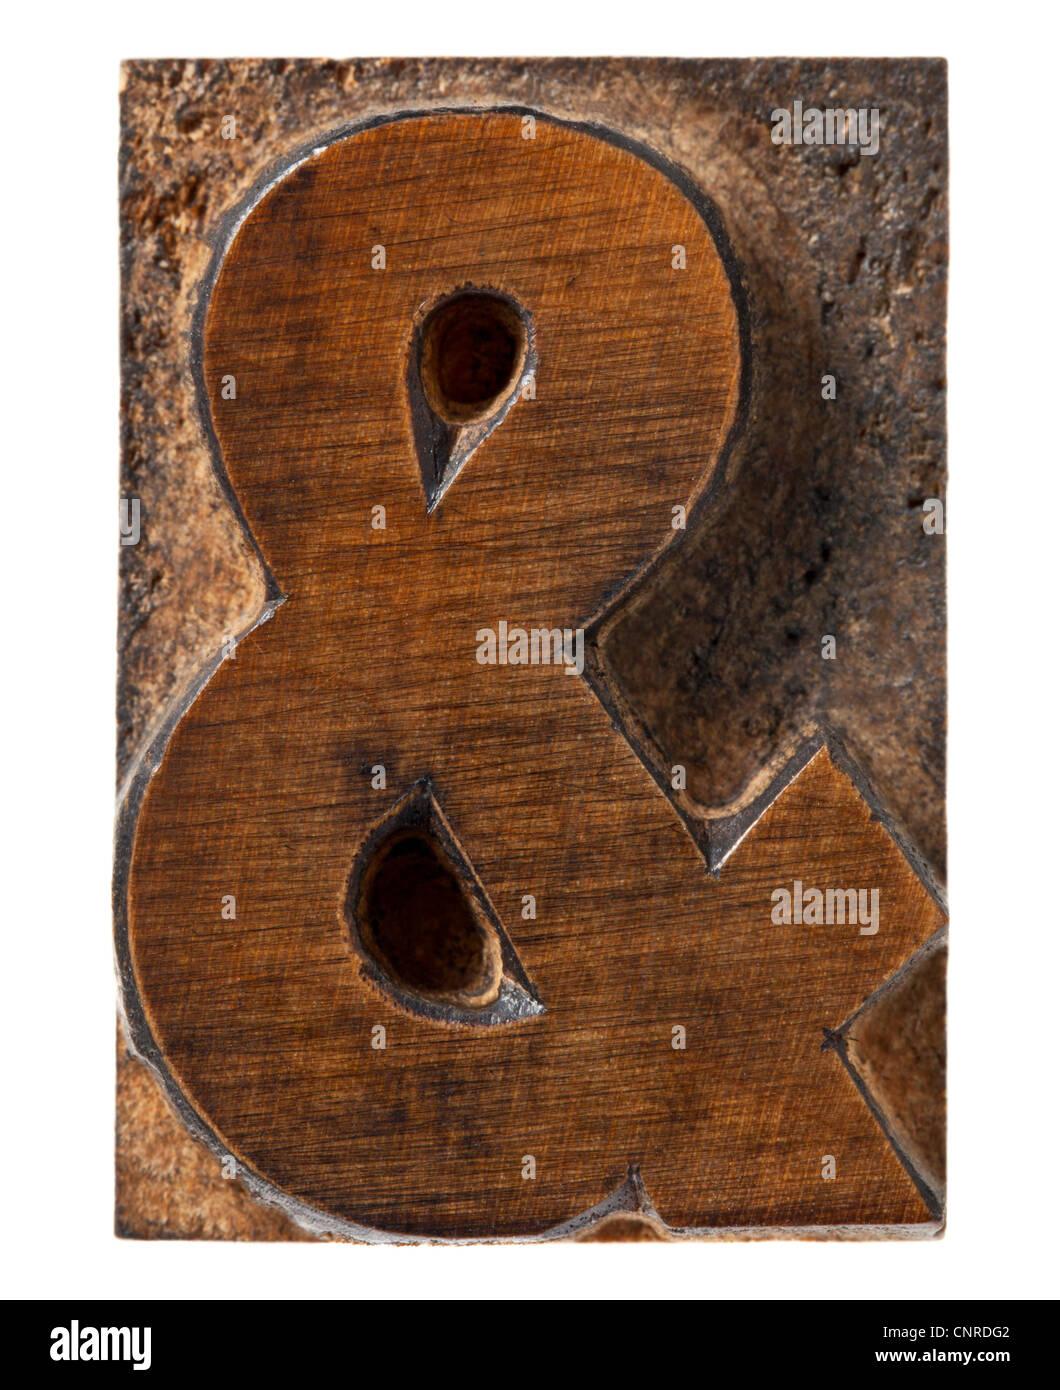 ampersand symbol - isolated vintage wood letterpress type block - Stock Image